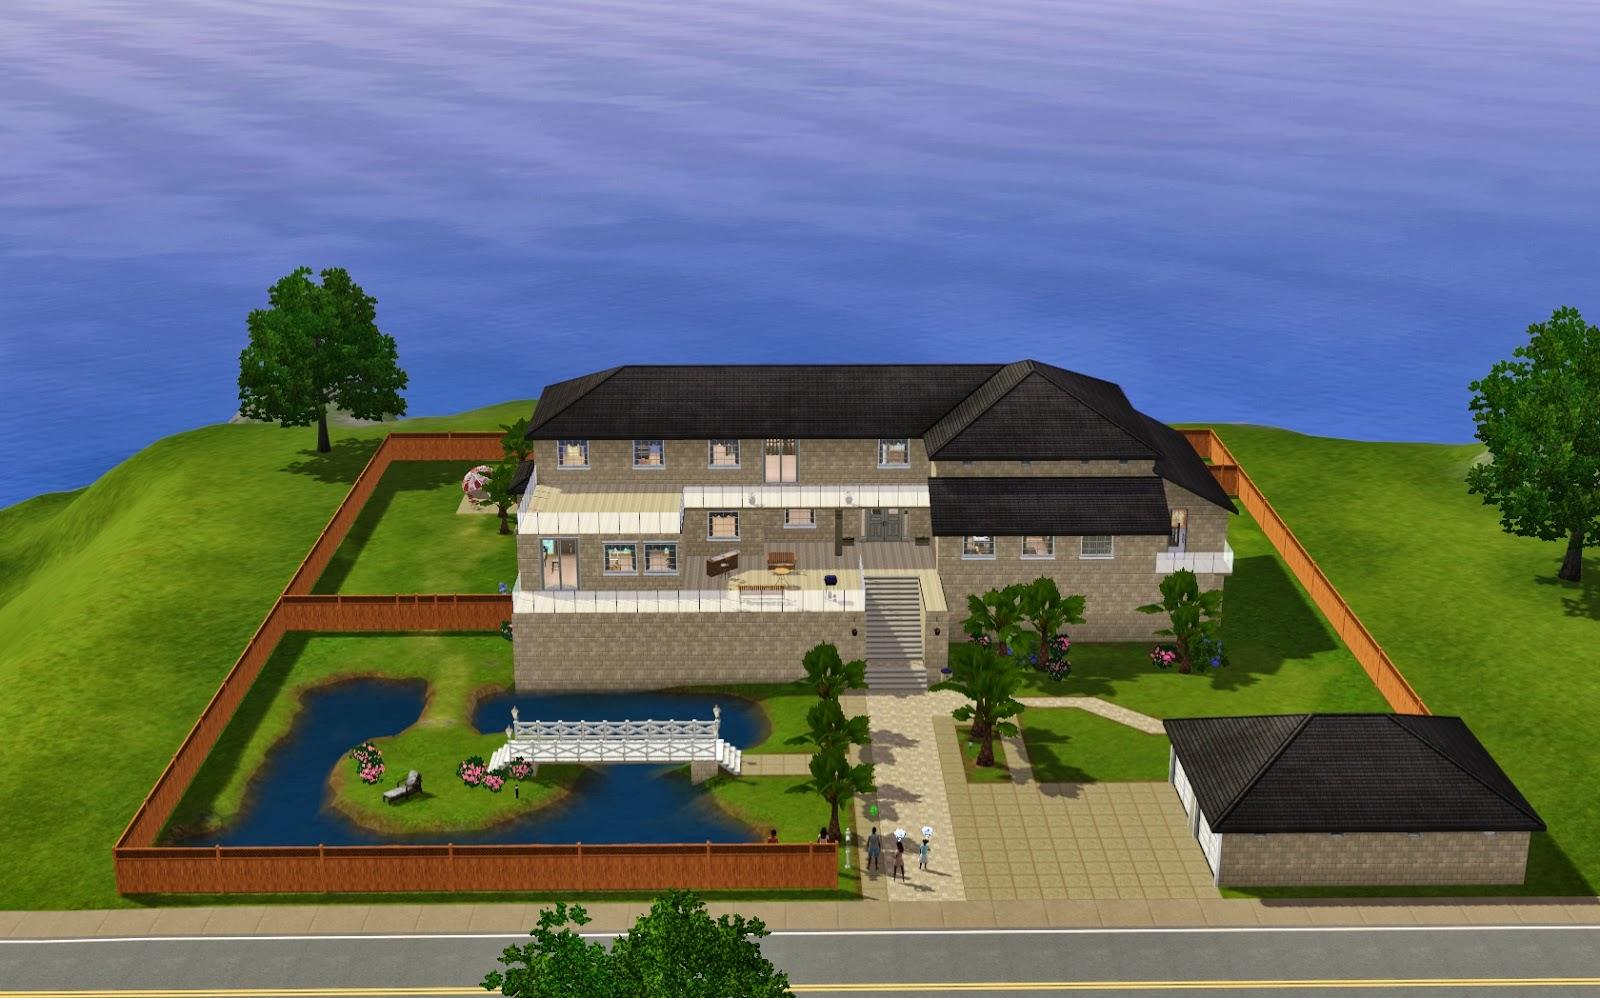 summer s little sims 3 garden barnacle bay list of houses rh sims3 garden blogspot com